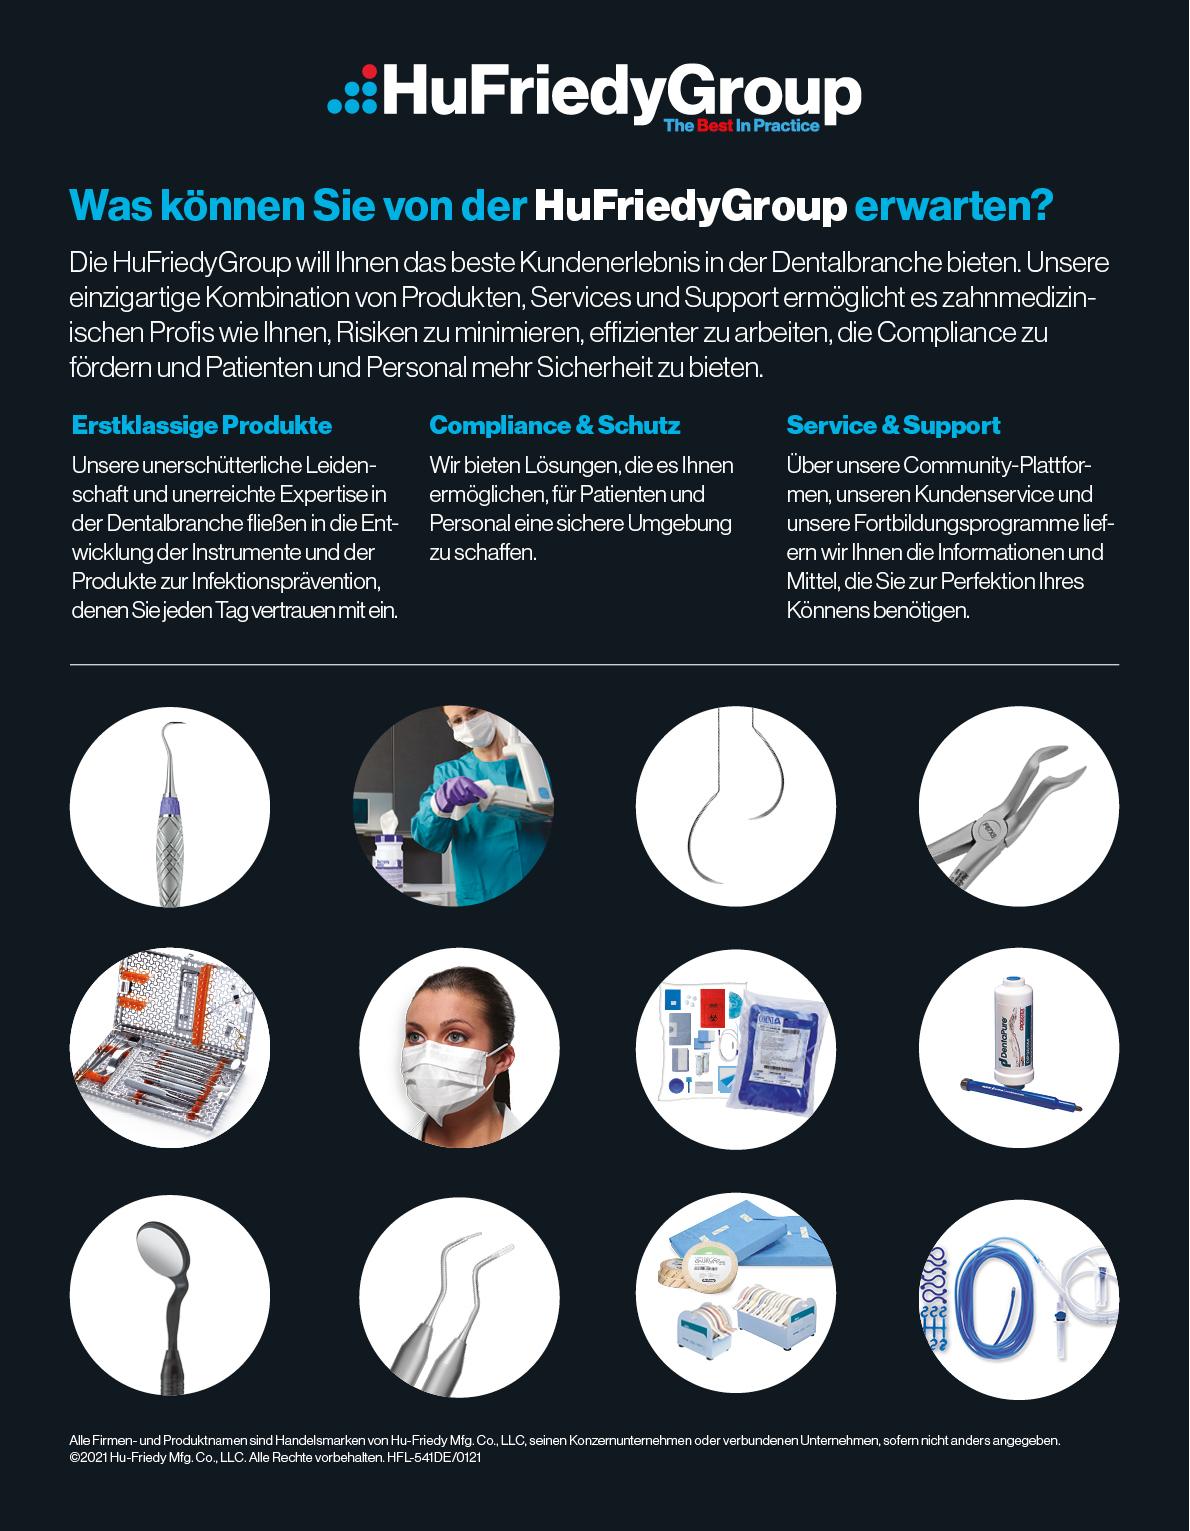 HuFriedyGroup